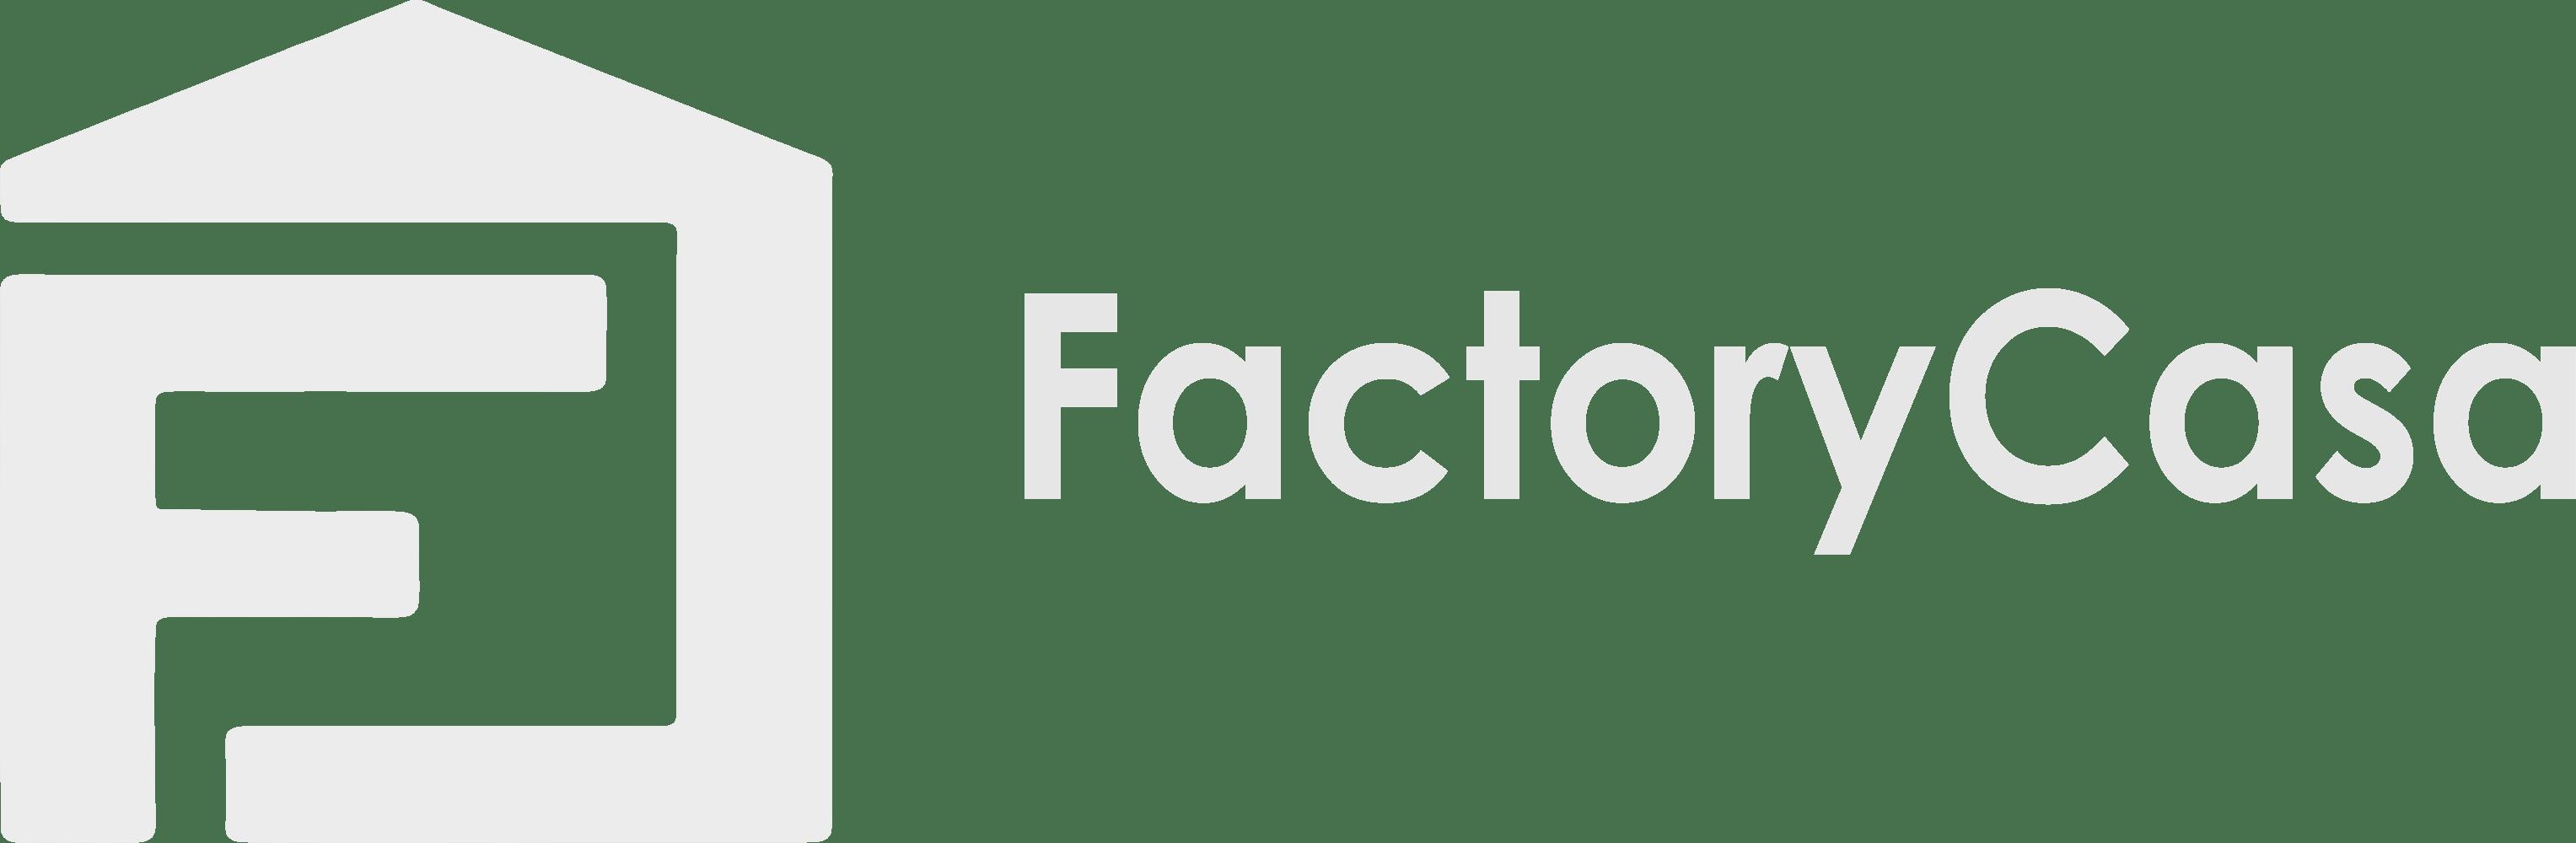 FactoryCasa